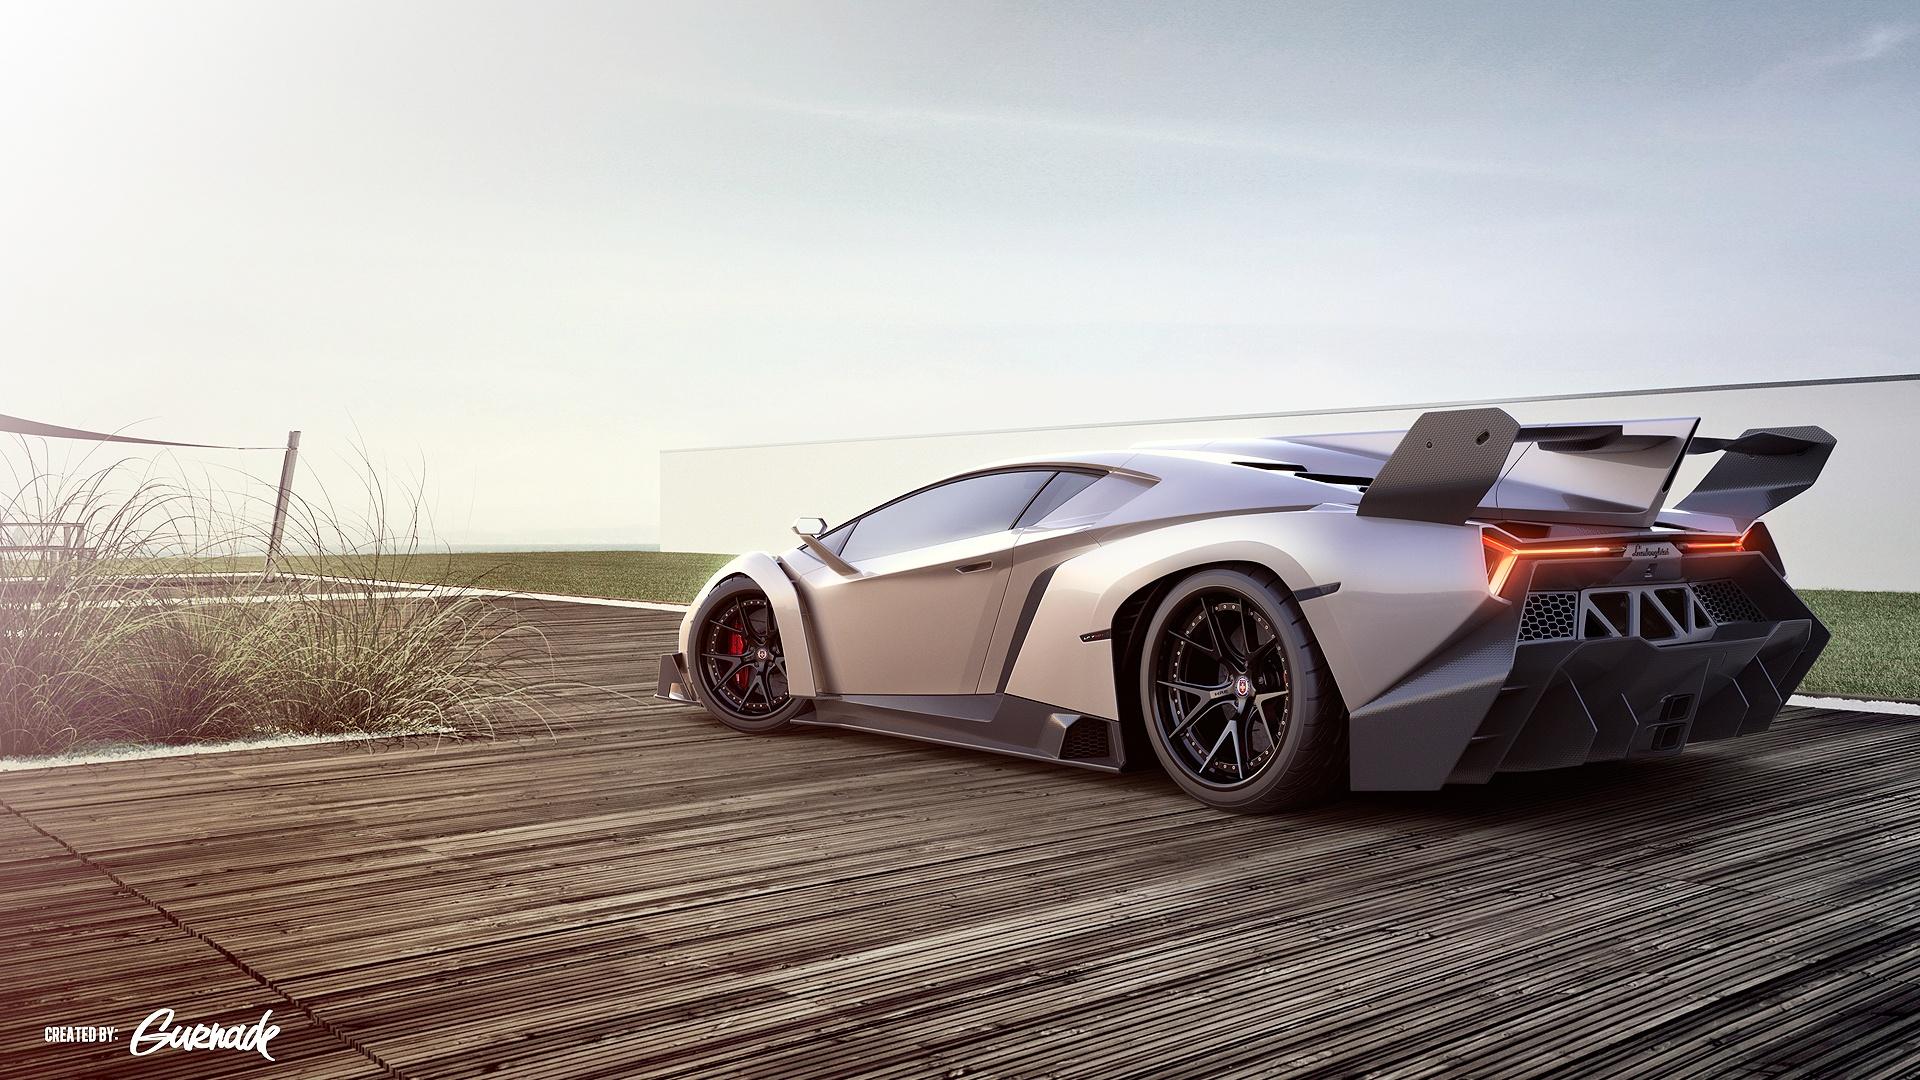 Lamborghini Veneno Sports Car Wallpapers HD Wallpapers 1920x1080